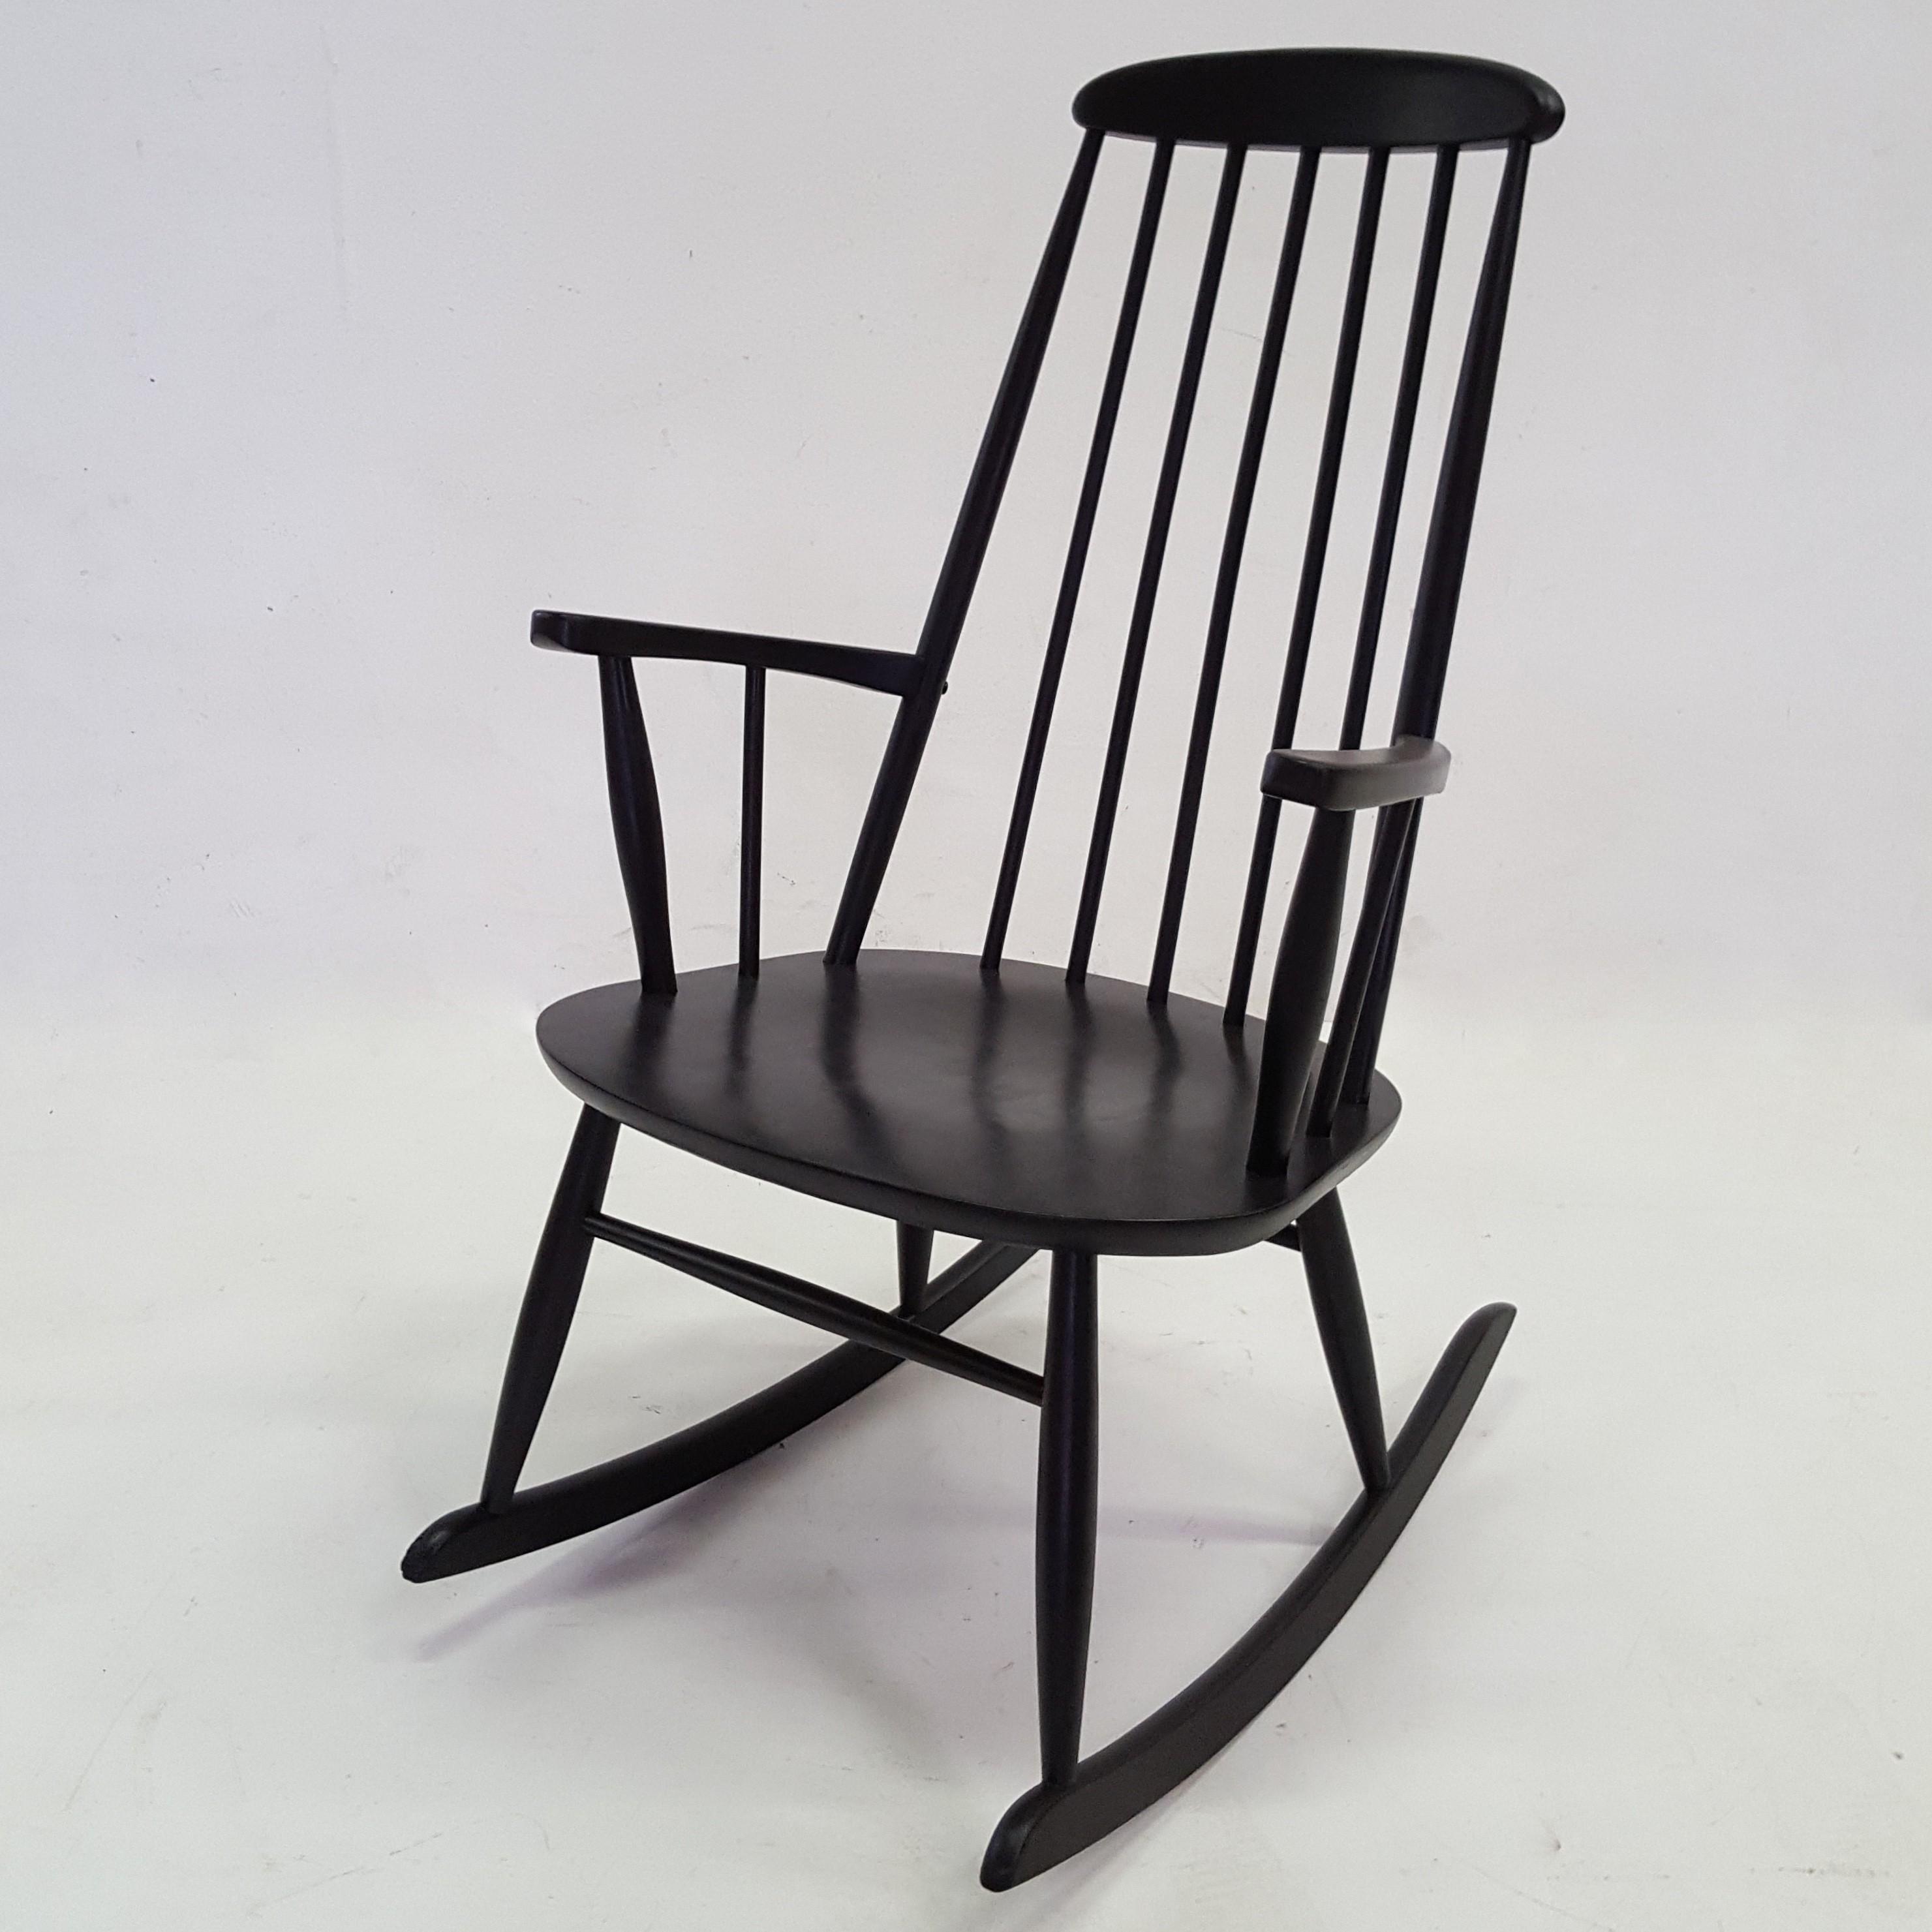 Scandinavian Rocking Chair In Beechwood By Rolan Rainer   1950s. Previous  Next